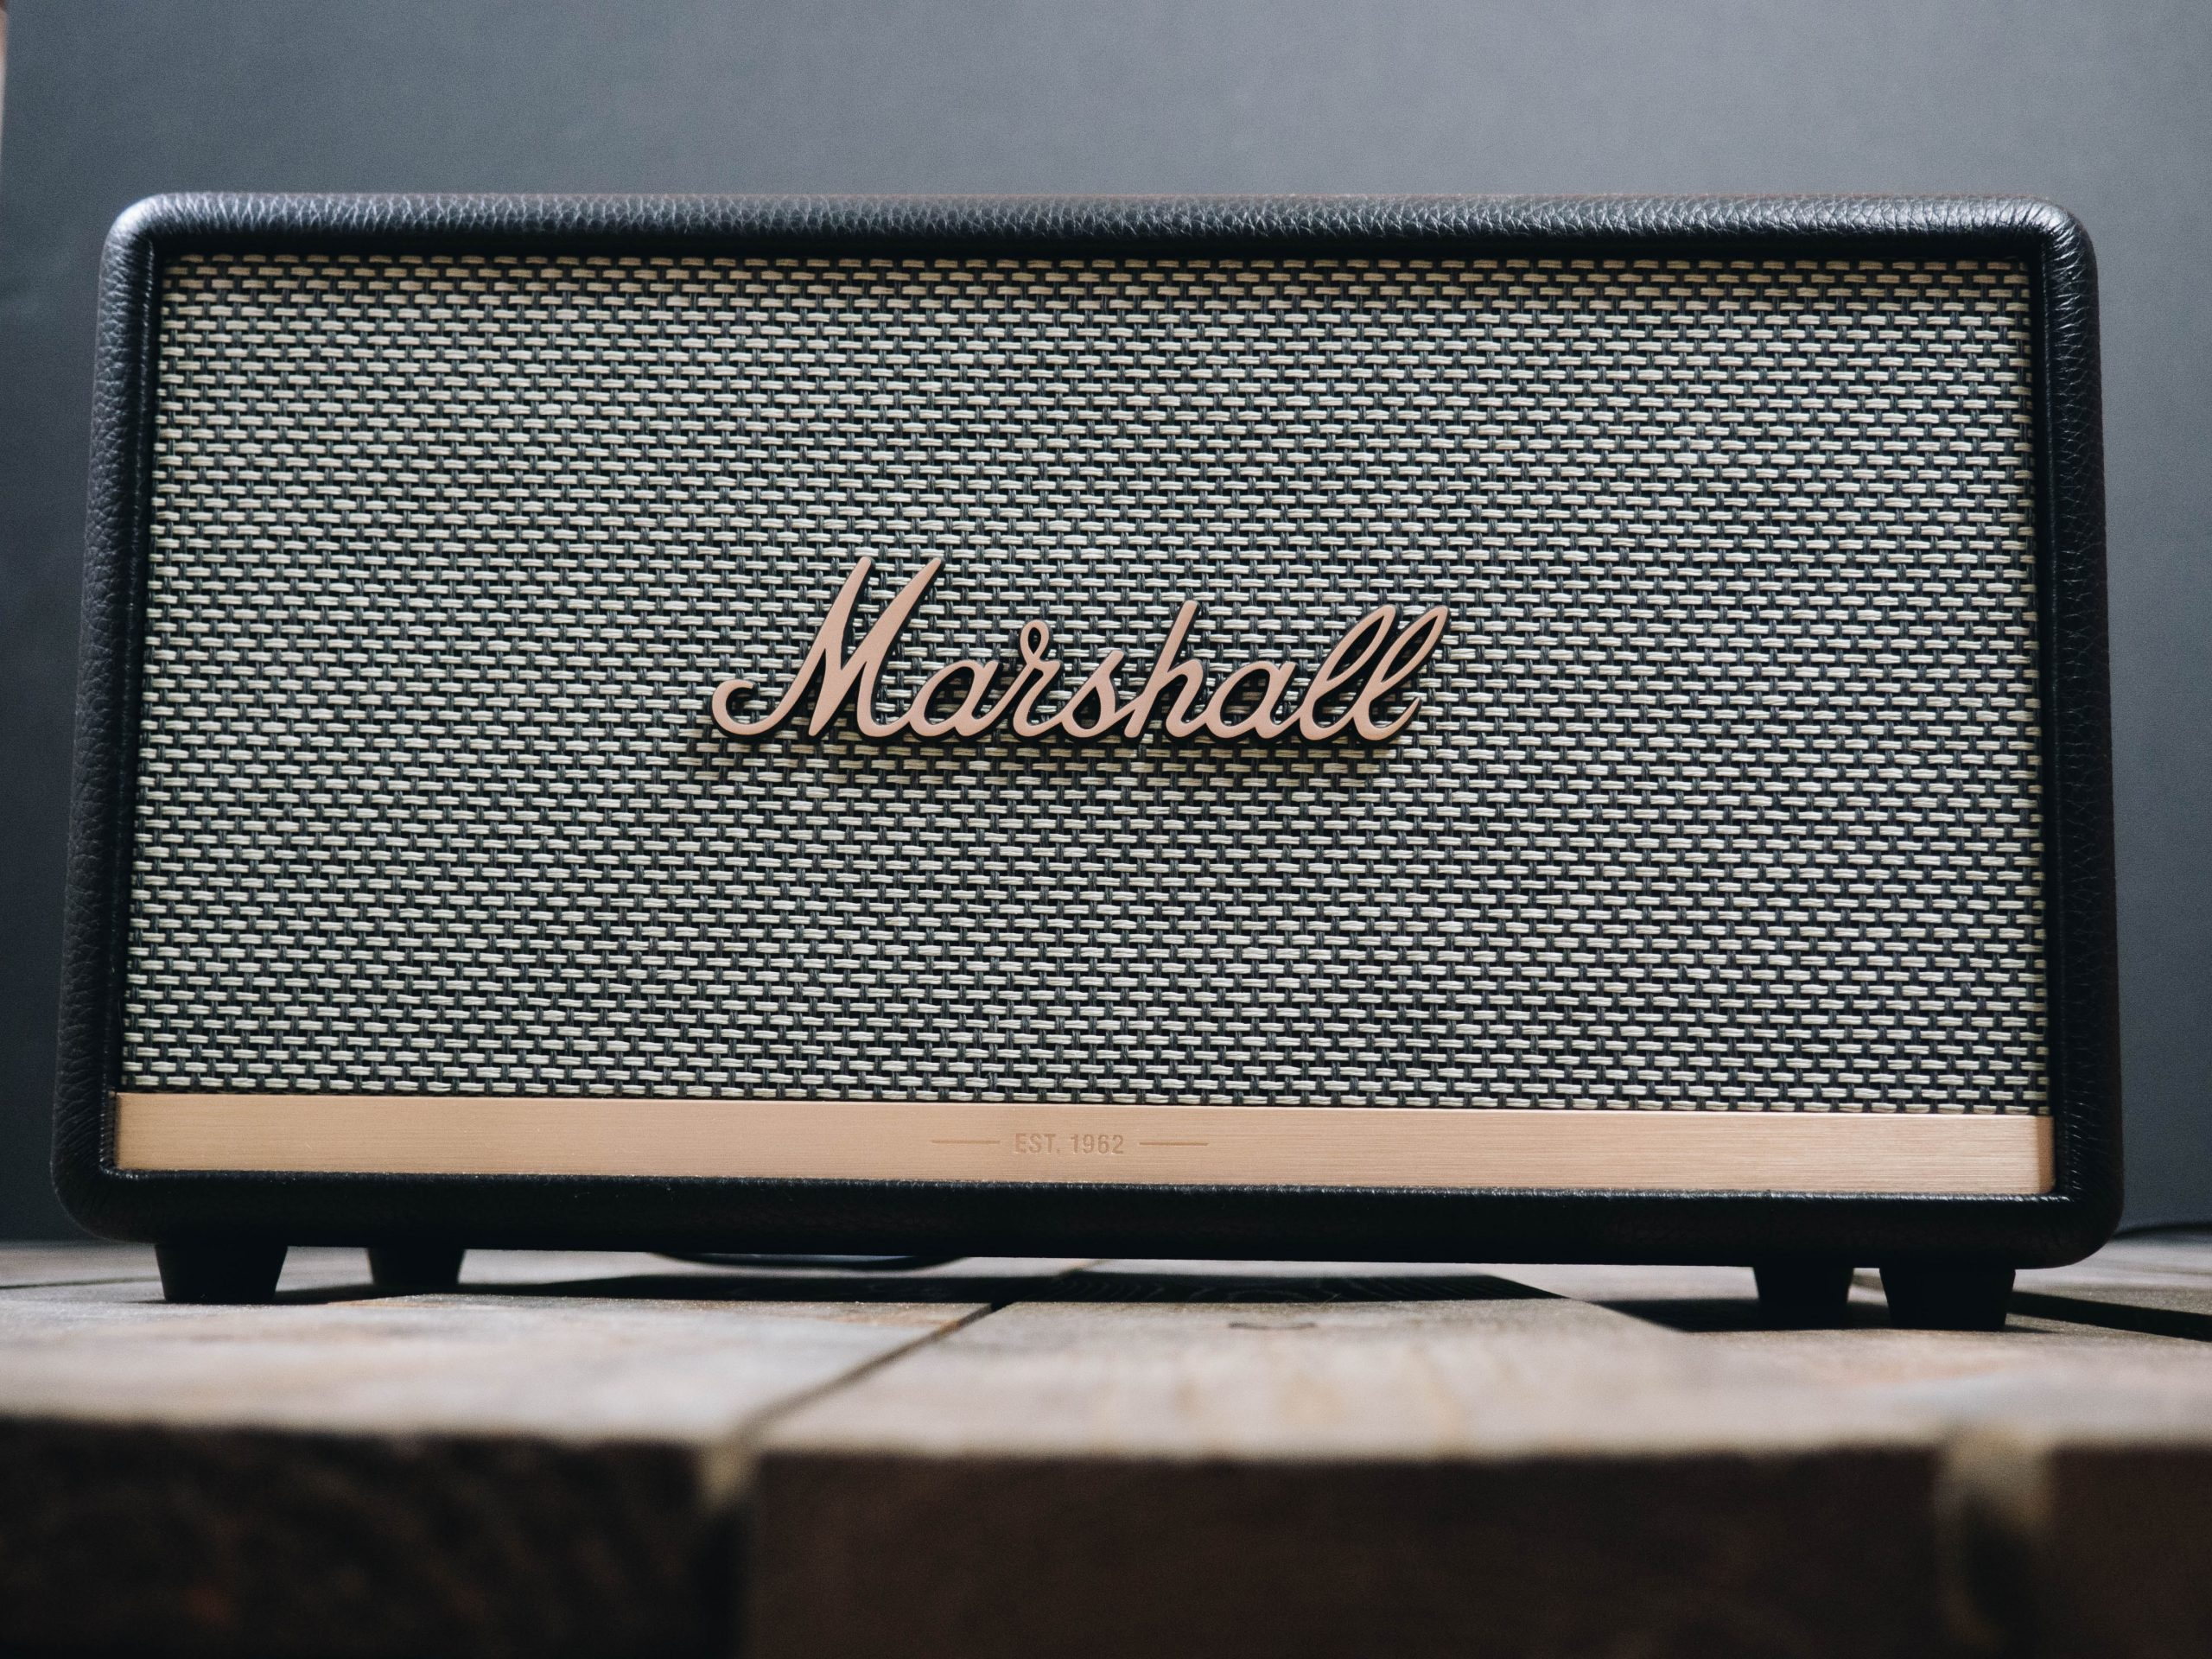 Vista de frente de amplificador marshall